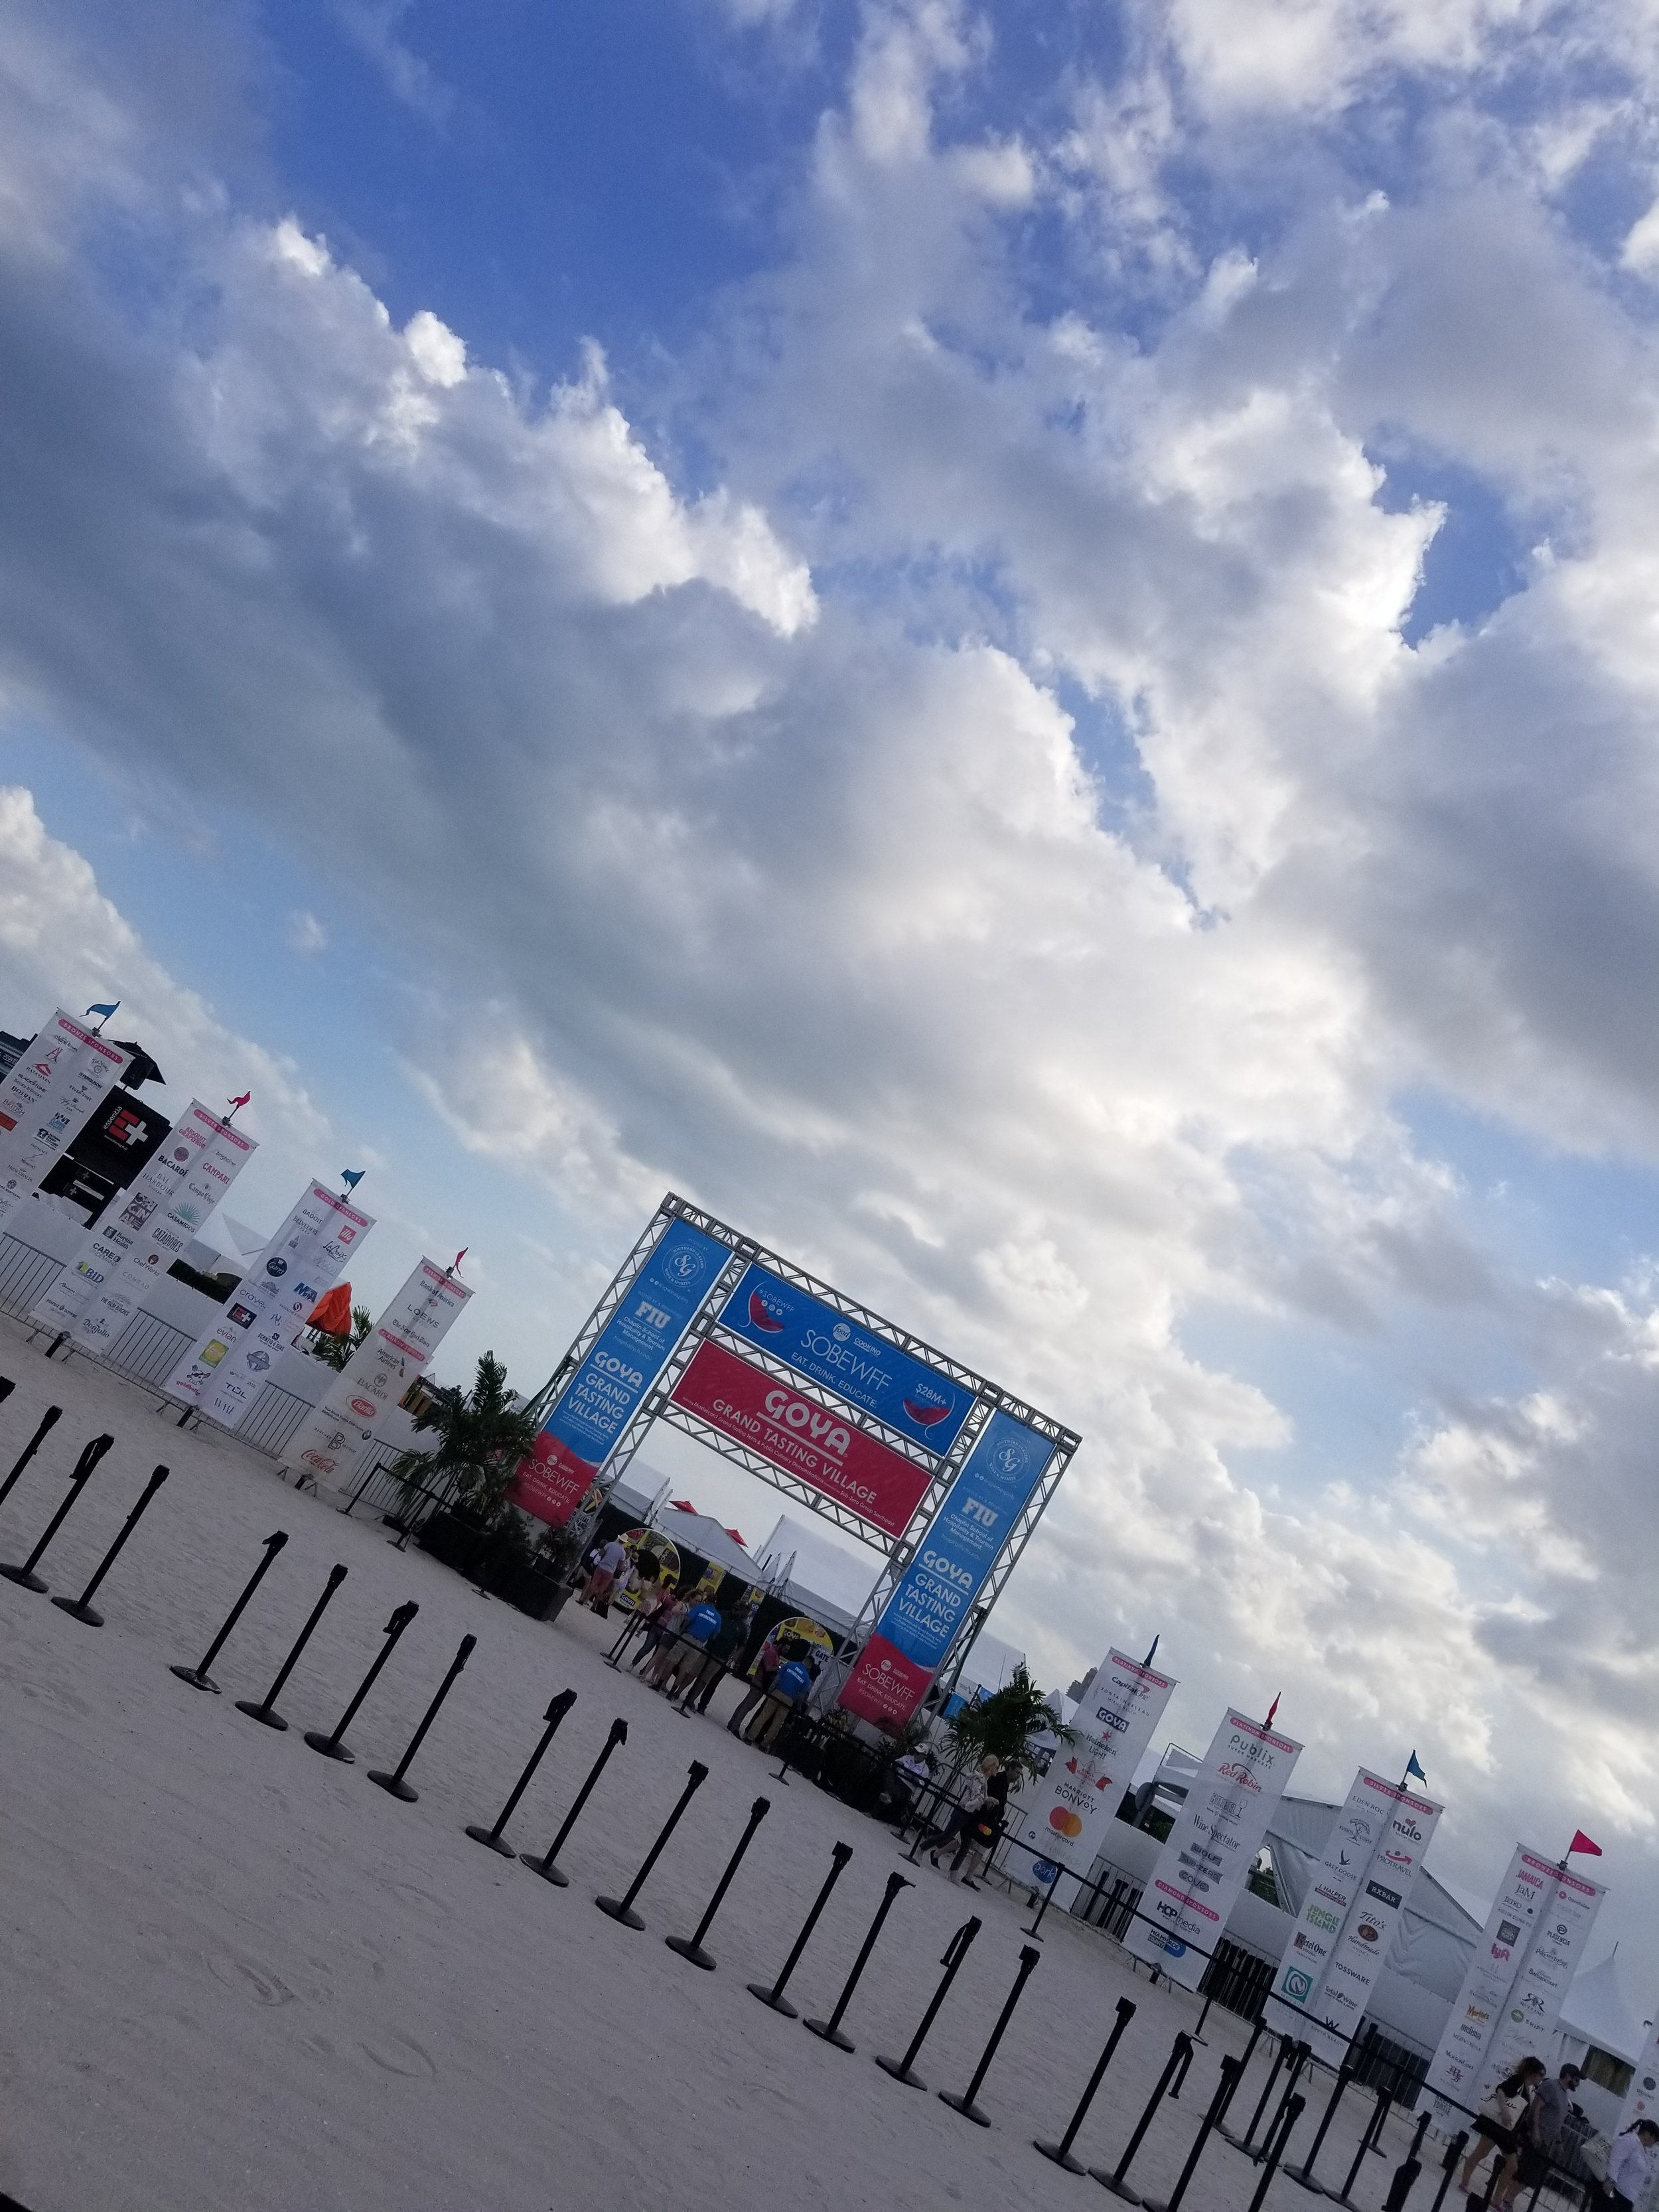 NNM 2019 - SOBEWFF - Entrance.jpg